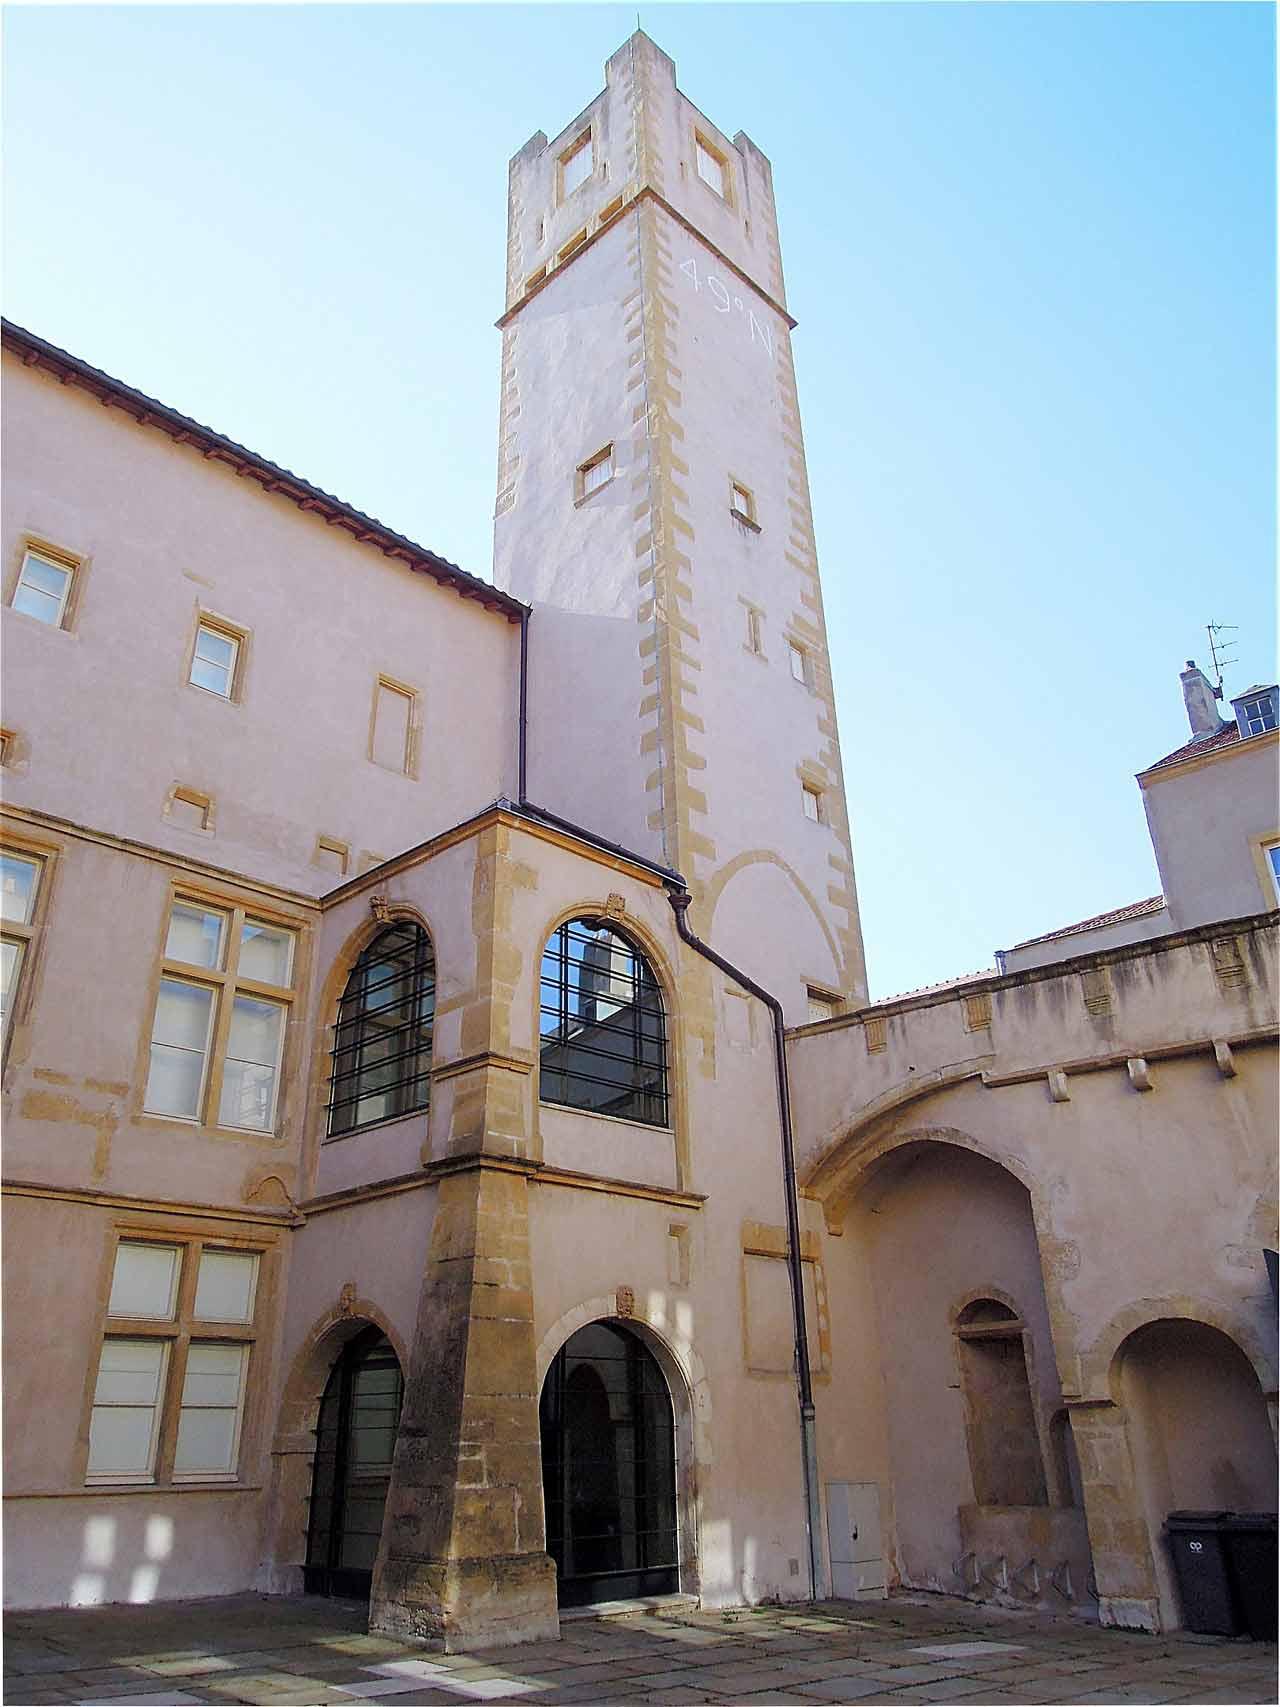 L'hôtel médiéval Saint-Livier à Metz